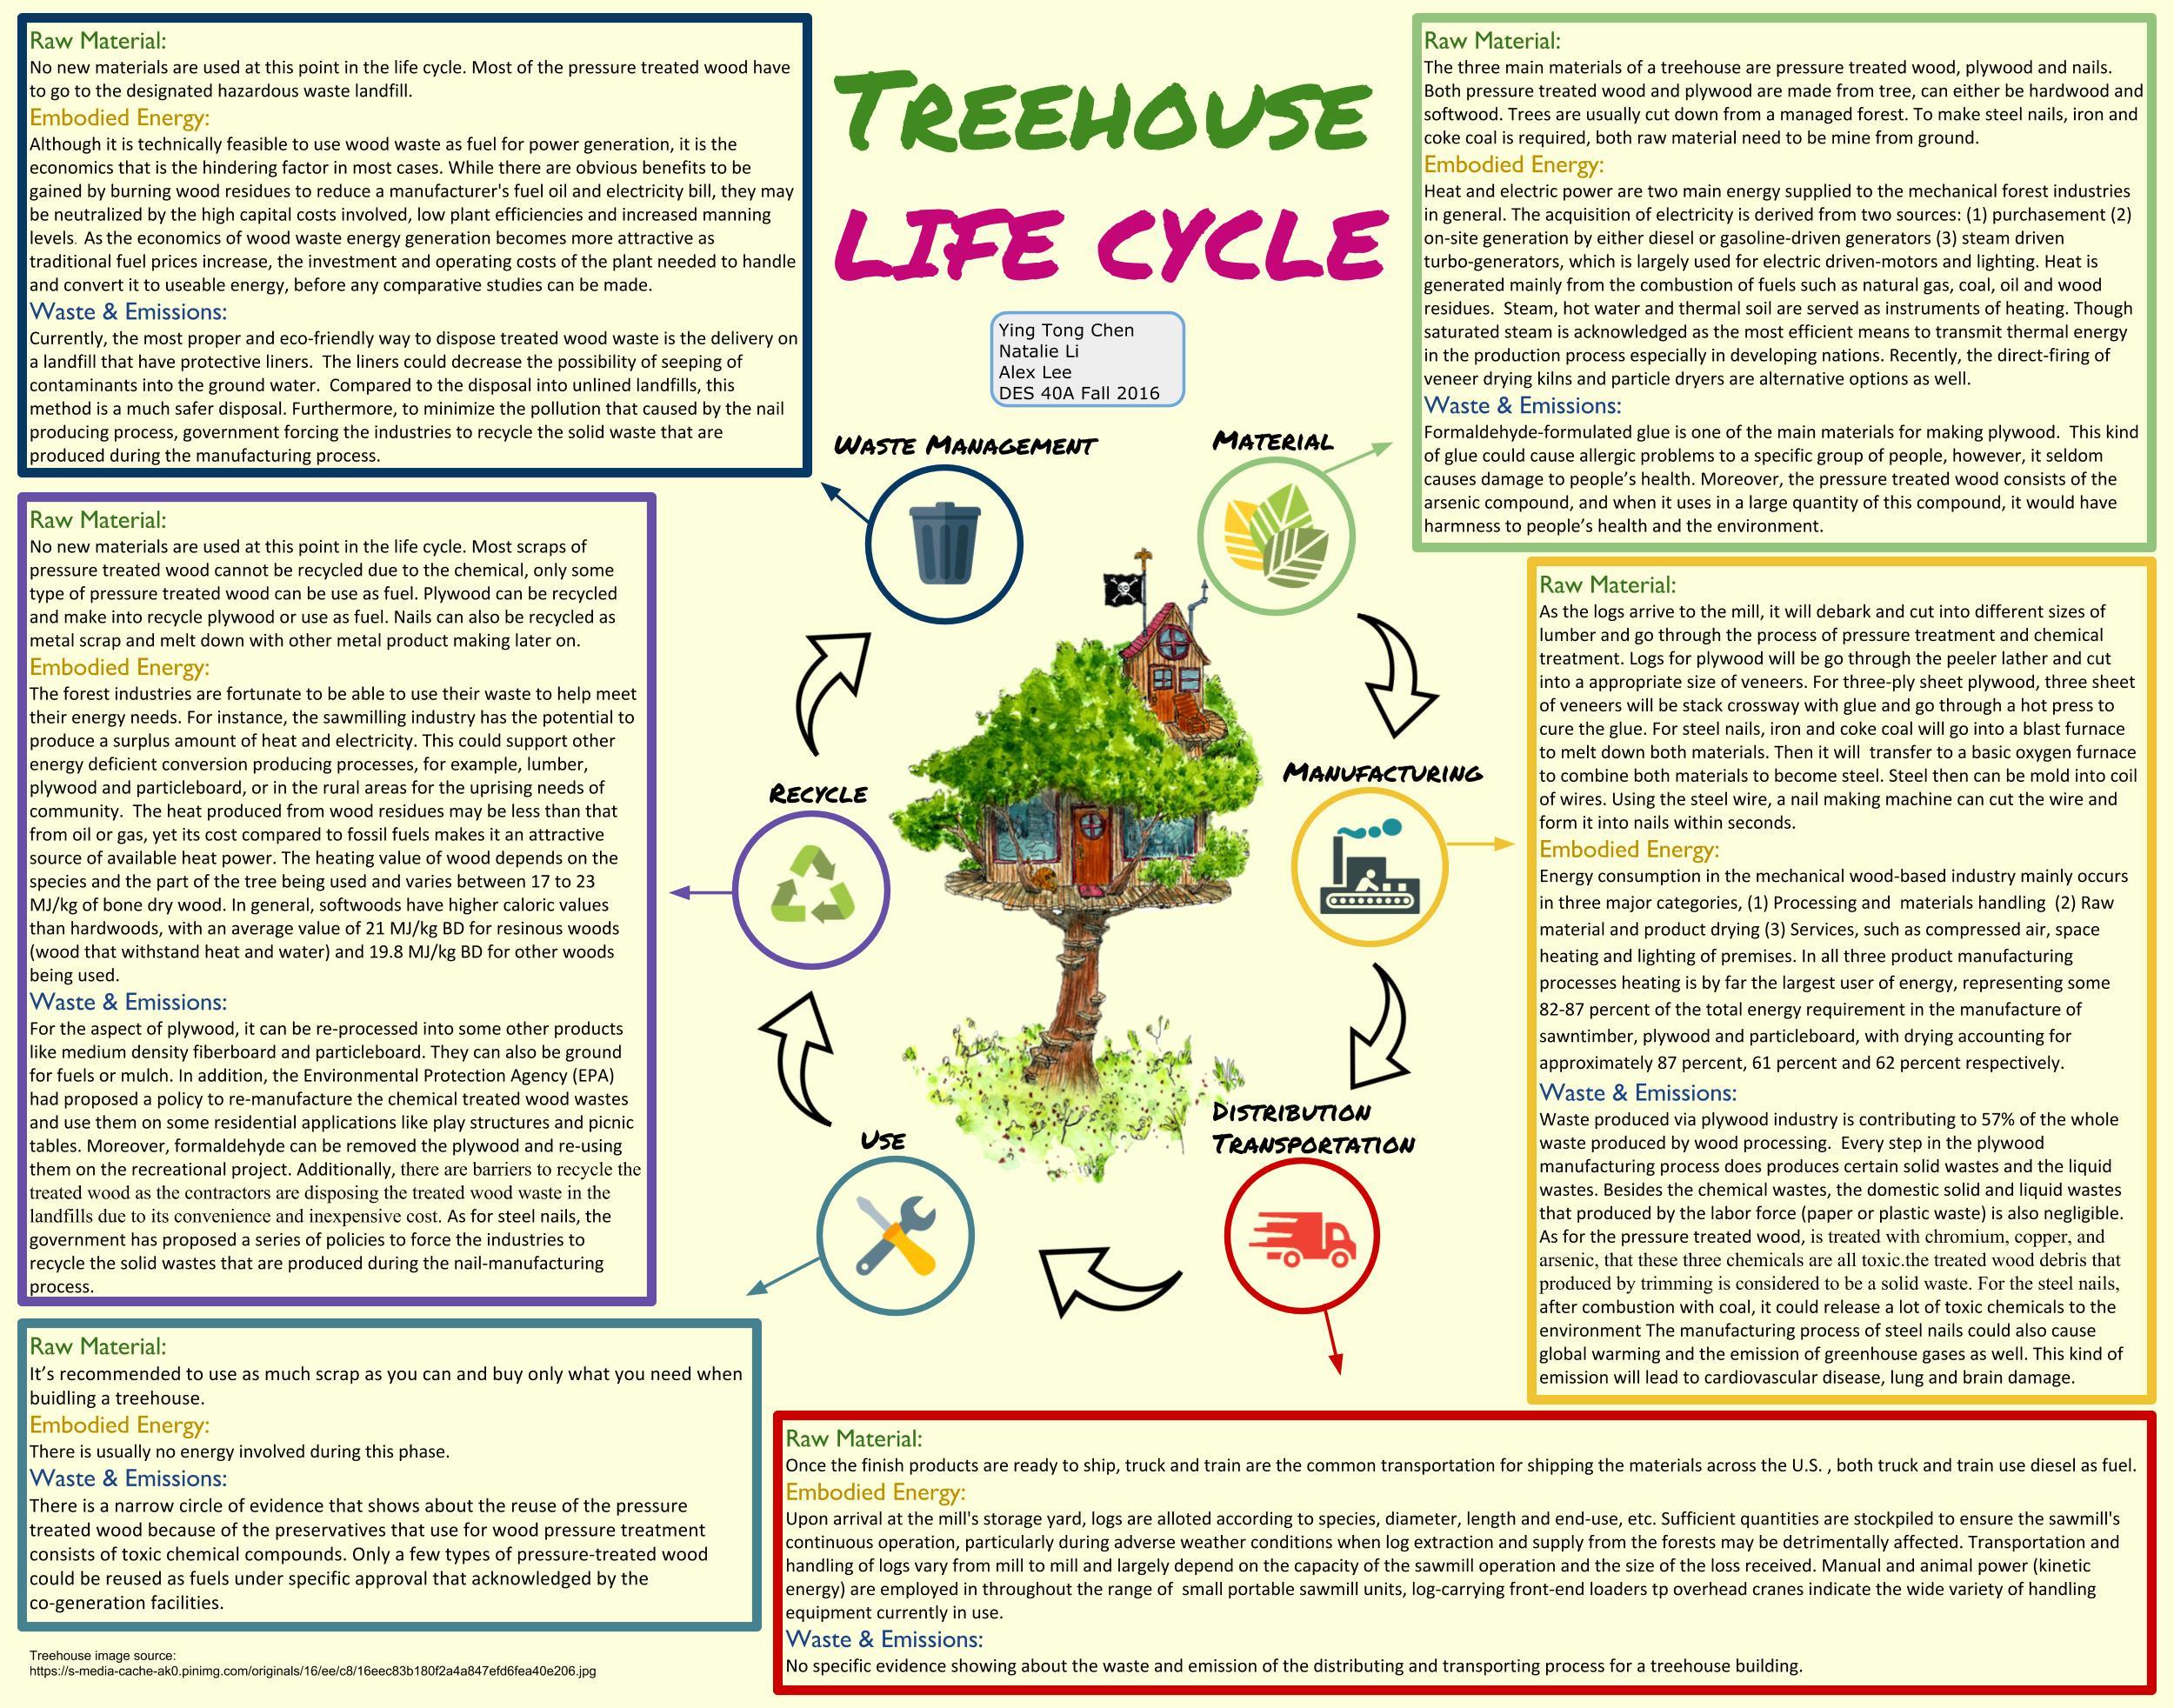 Tree House Life Cycle — Design Life-Cycle